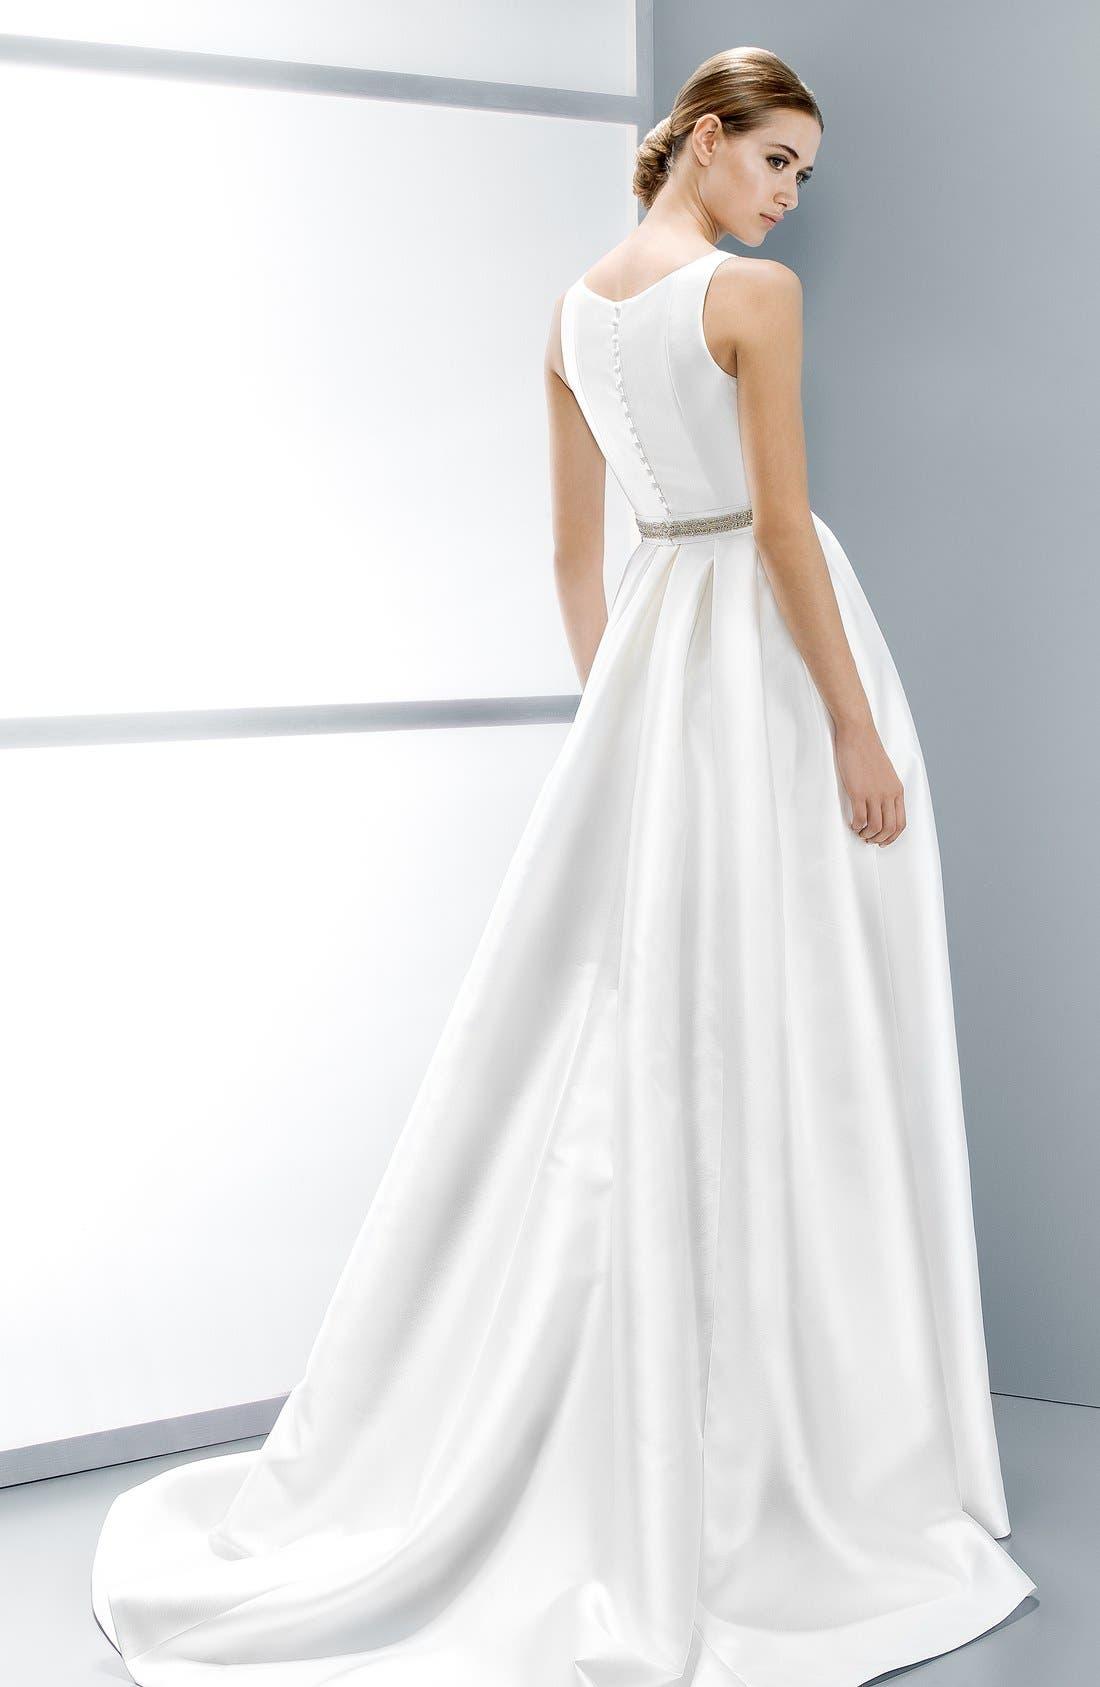 Embellished Waist Mikado A-Line Dress,                             Alternate thumbnail 6, color,                             IVORY